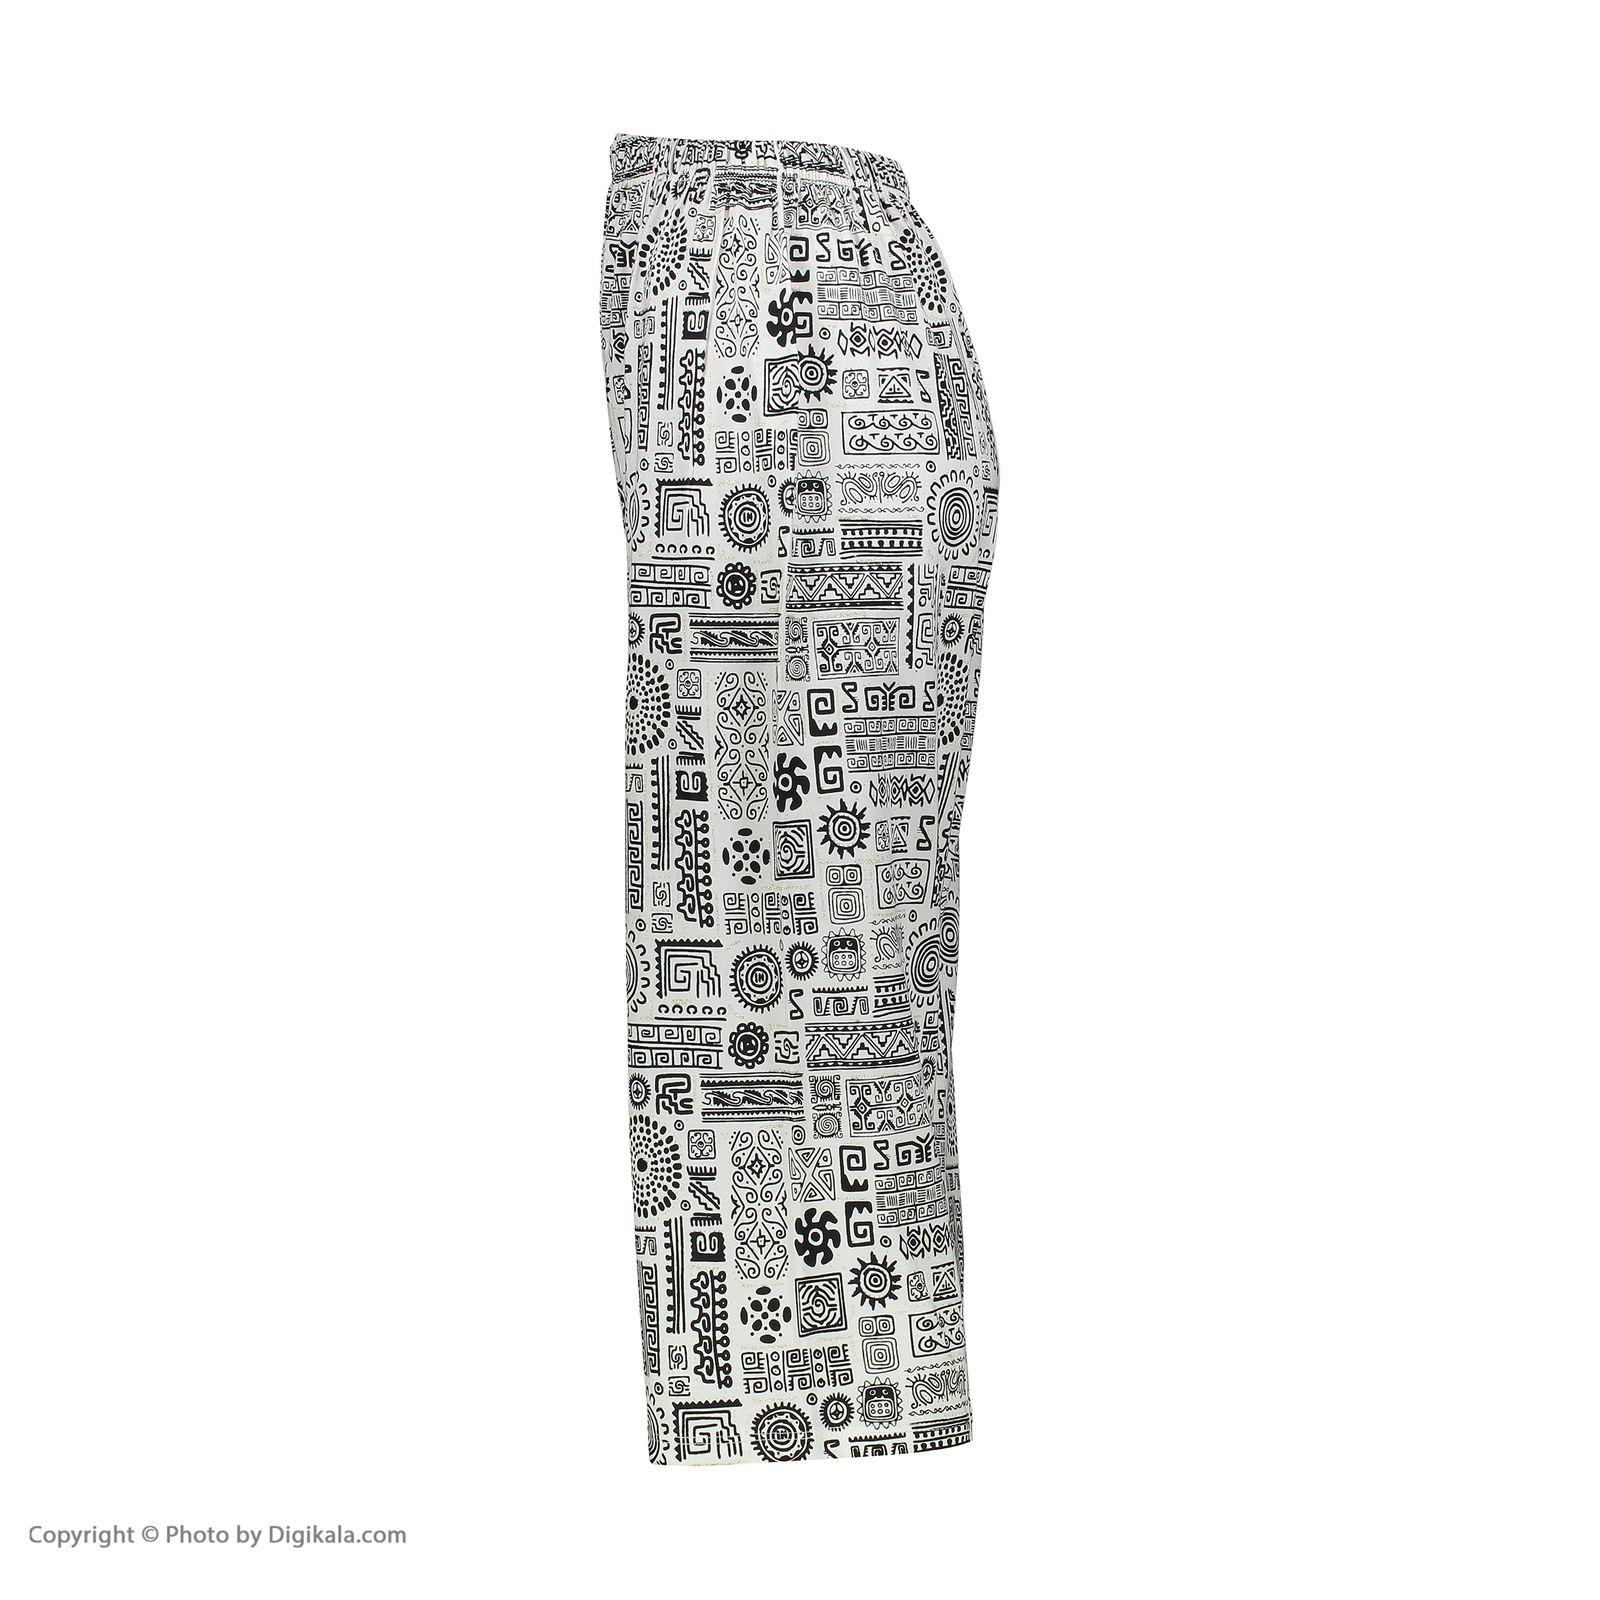 ست تاپ و شلوارک زنانه کد 0225 رنگ مشکی -  - 5